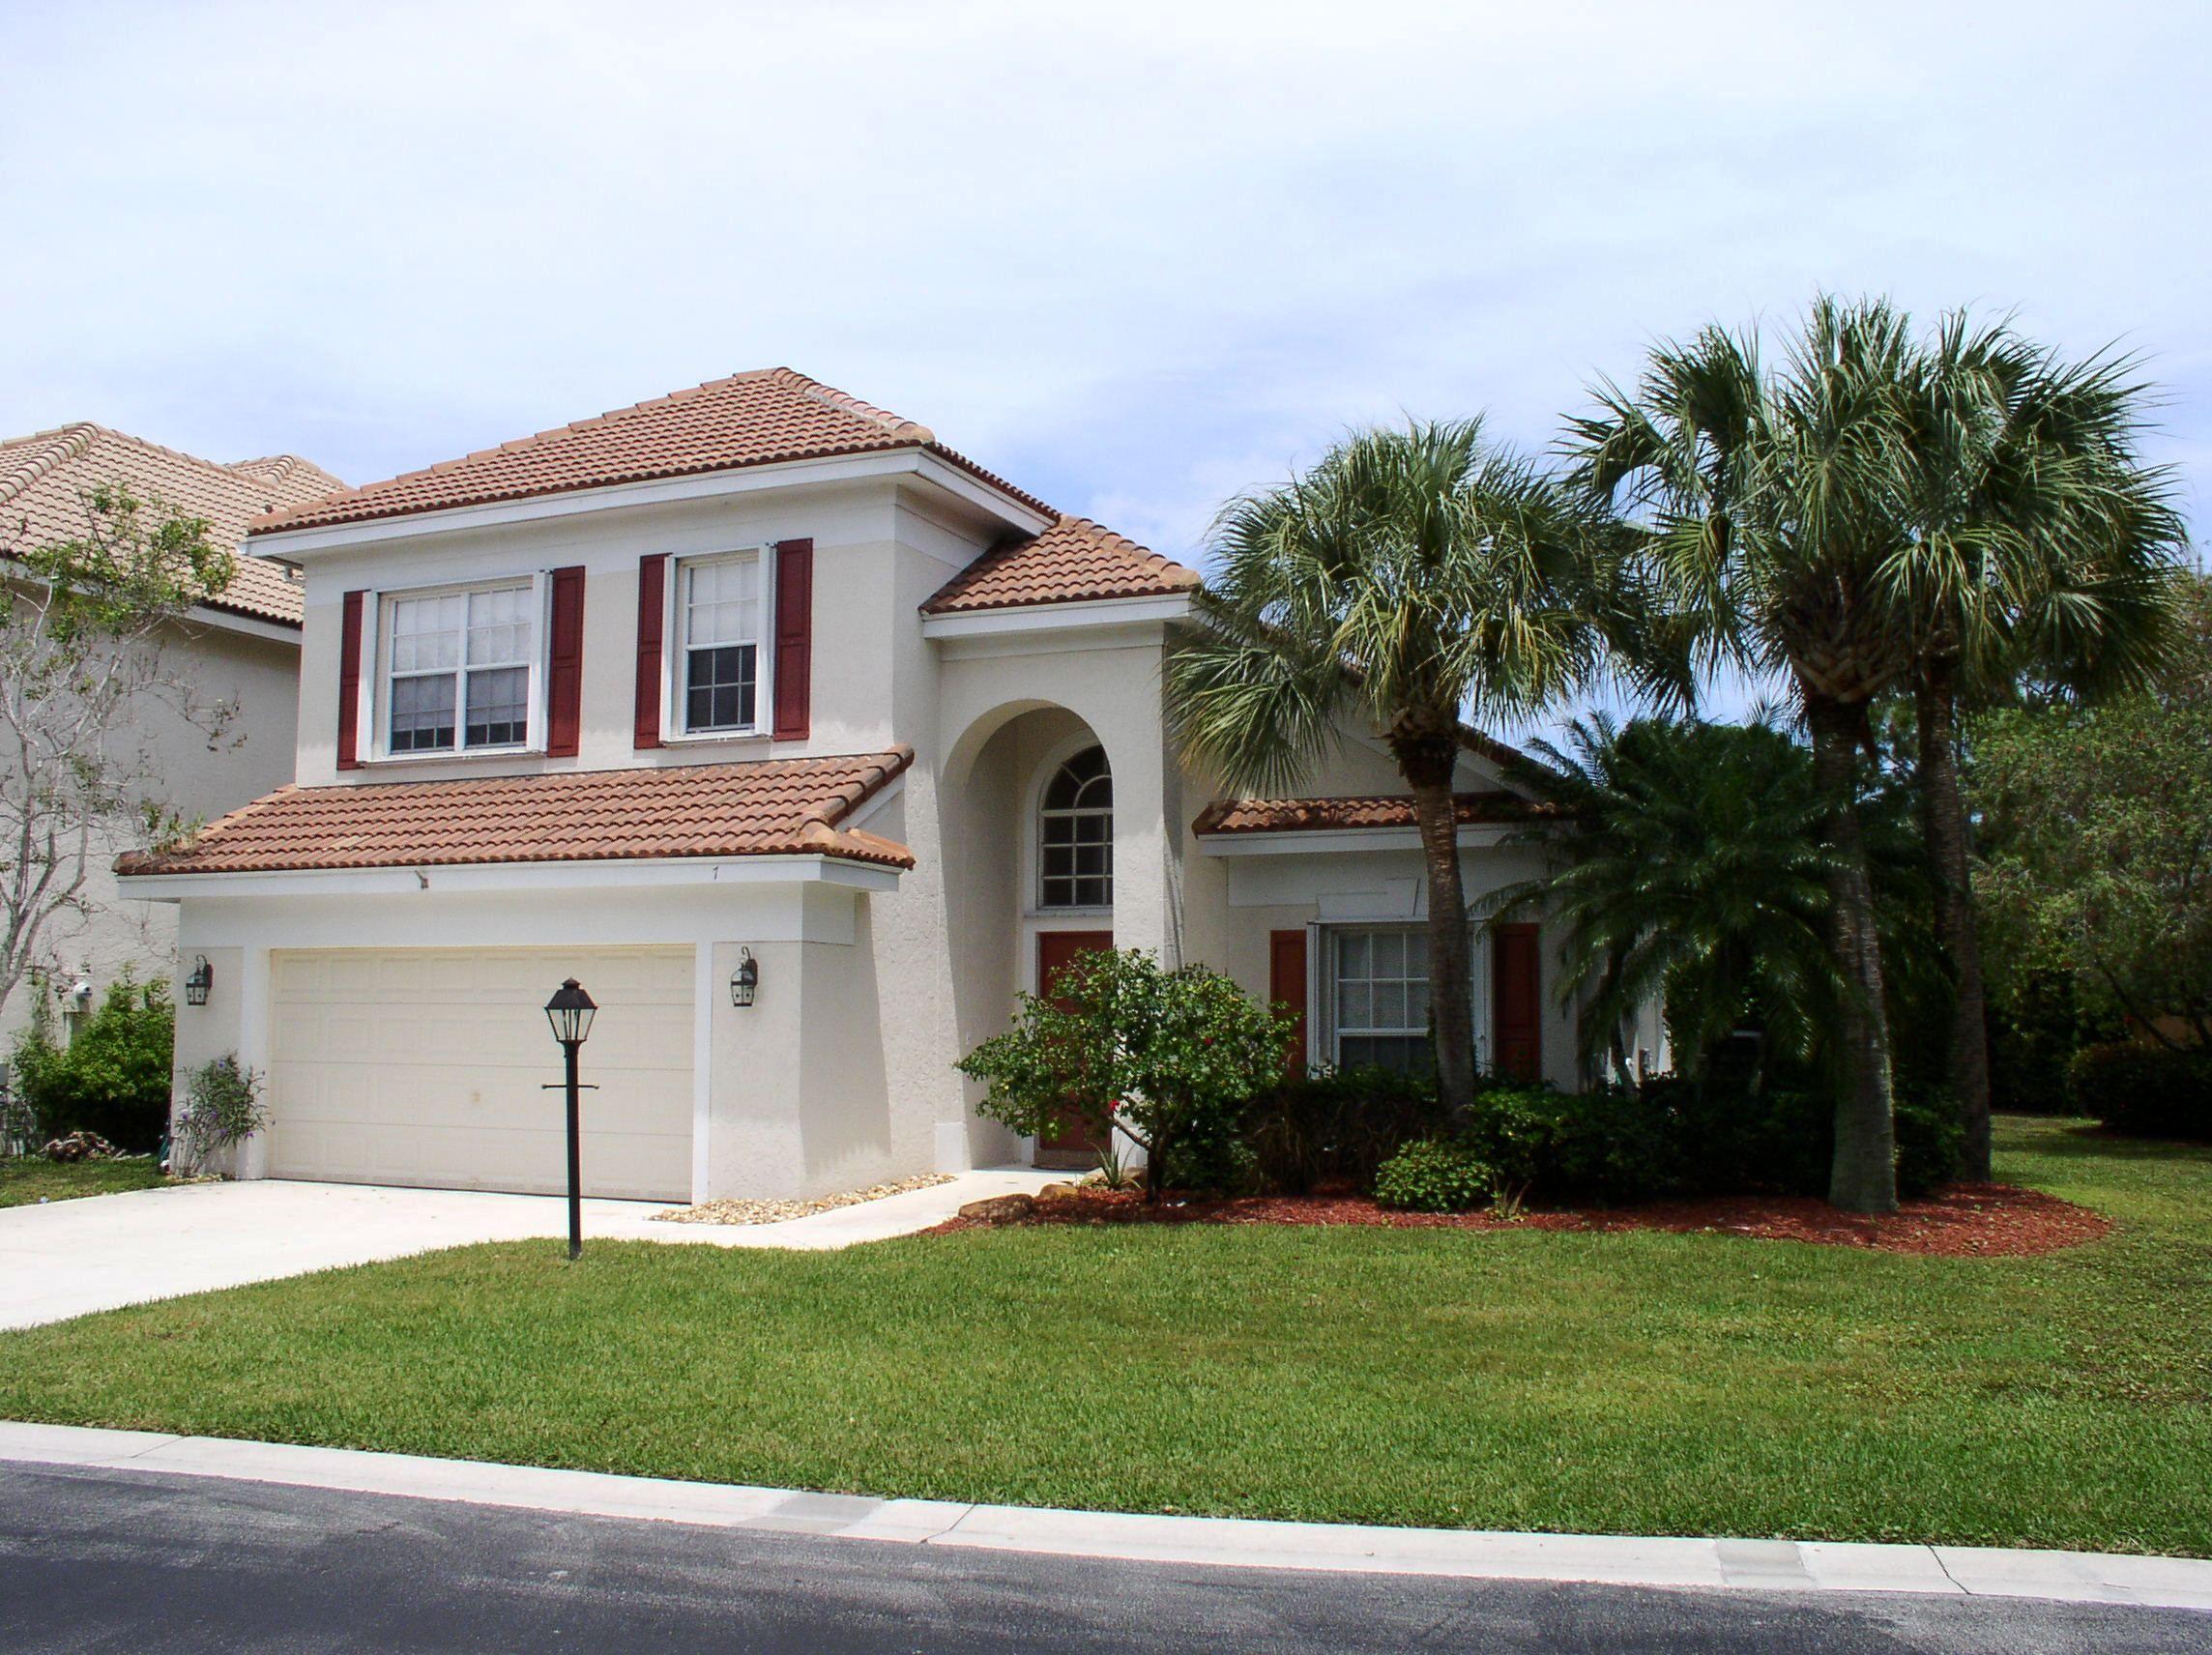 9b81d78bf38af652f25a8bff6c654fd5 - Sanctuary Cove Palm Beach Gardens Florida